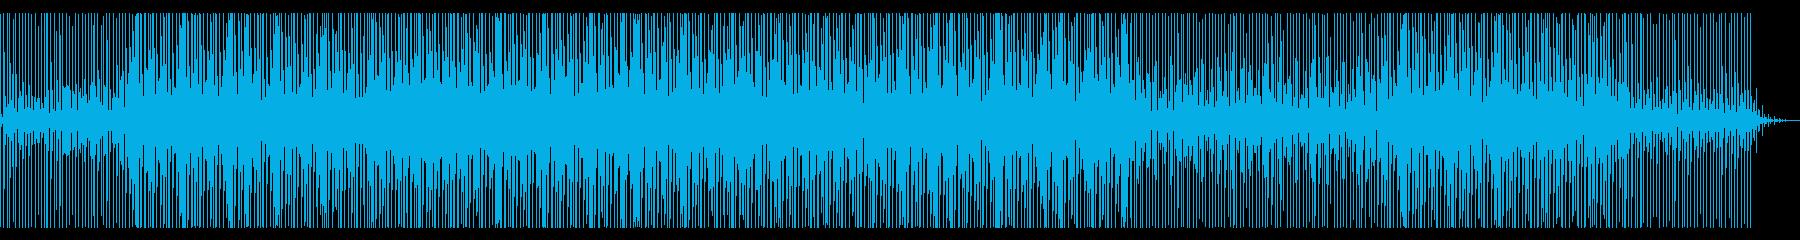 LightHouseの再生済みの波形